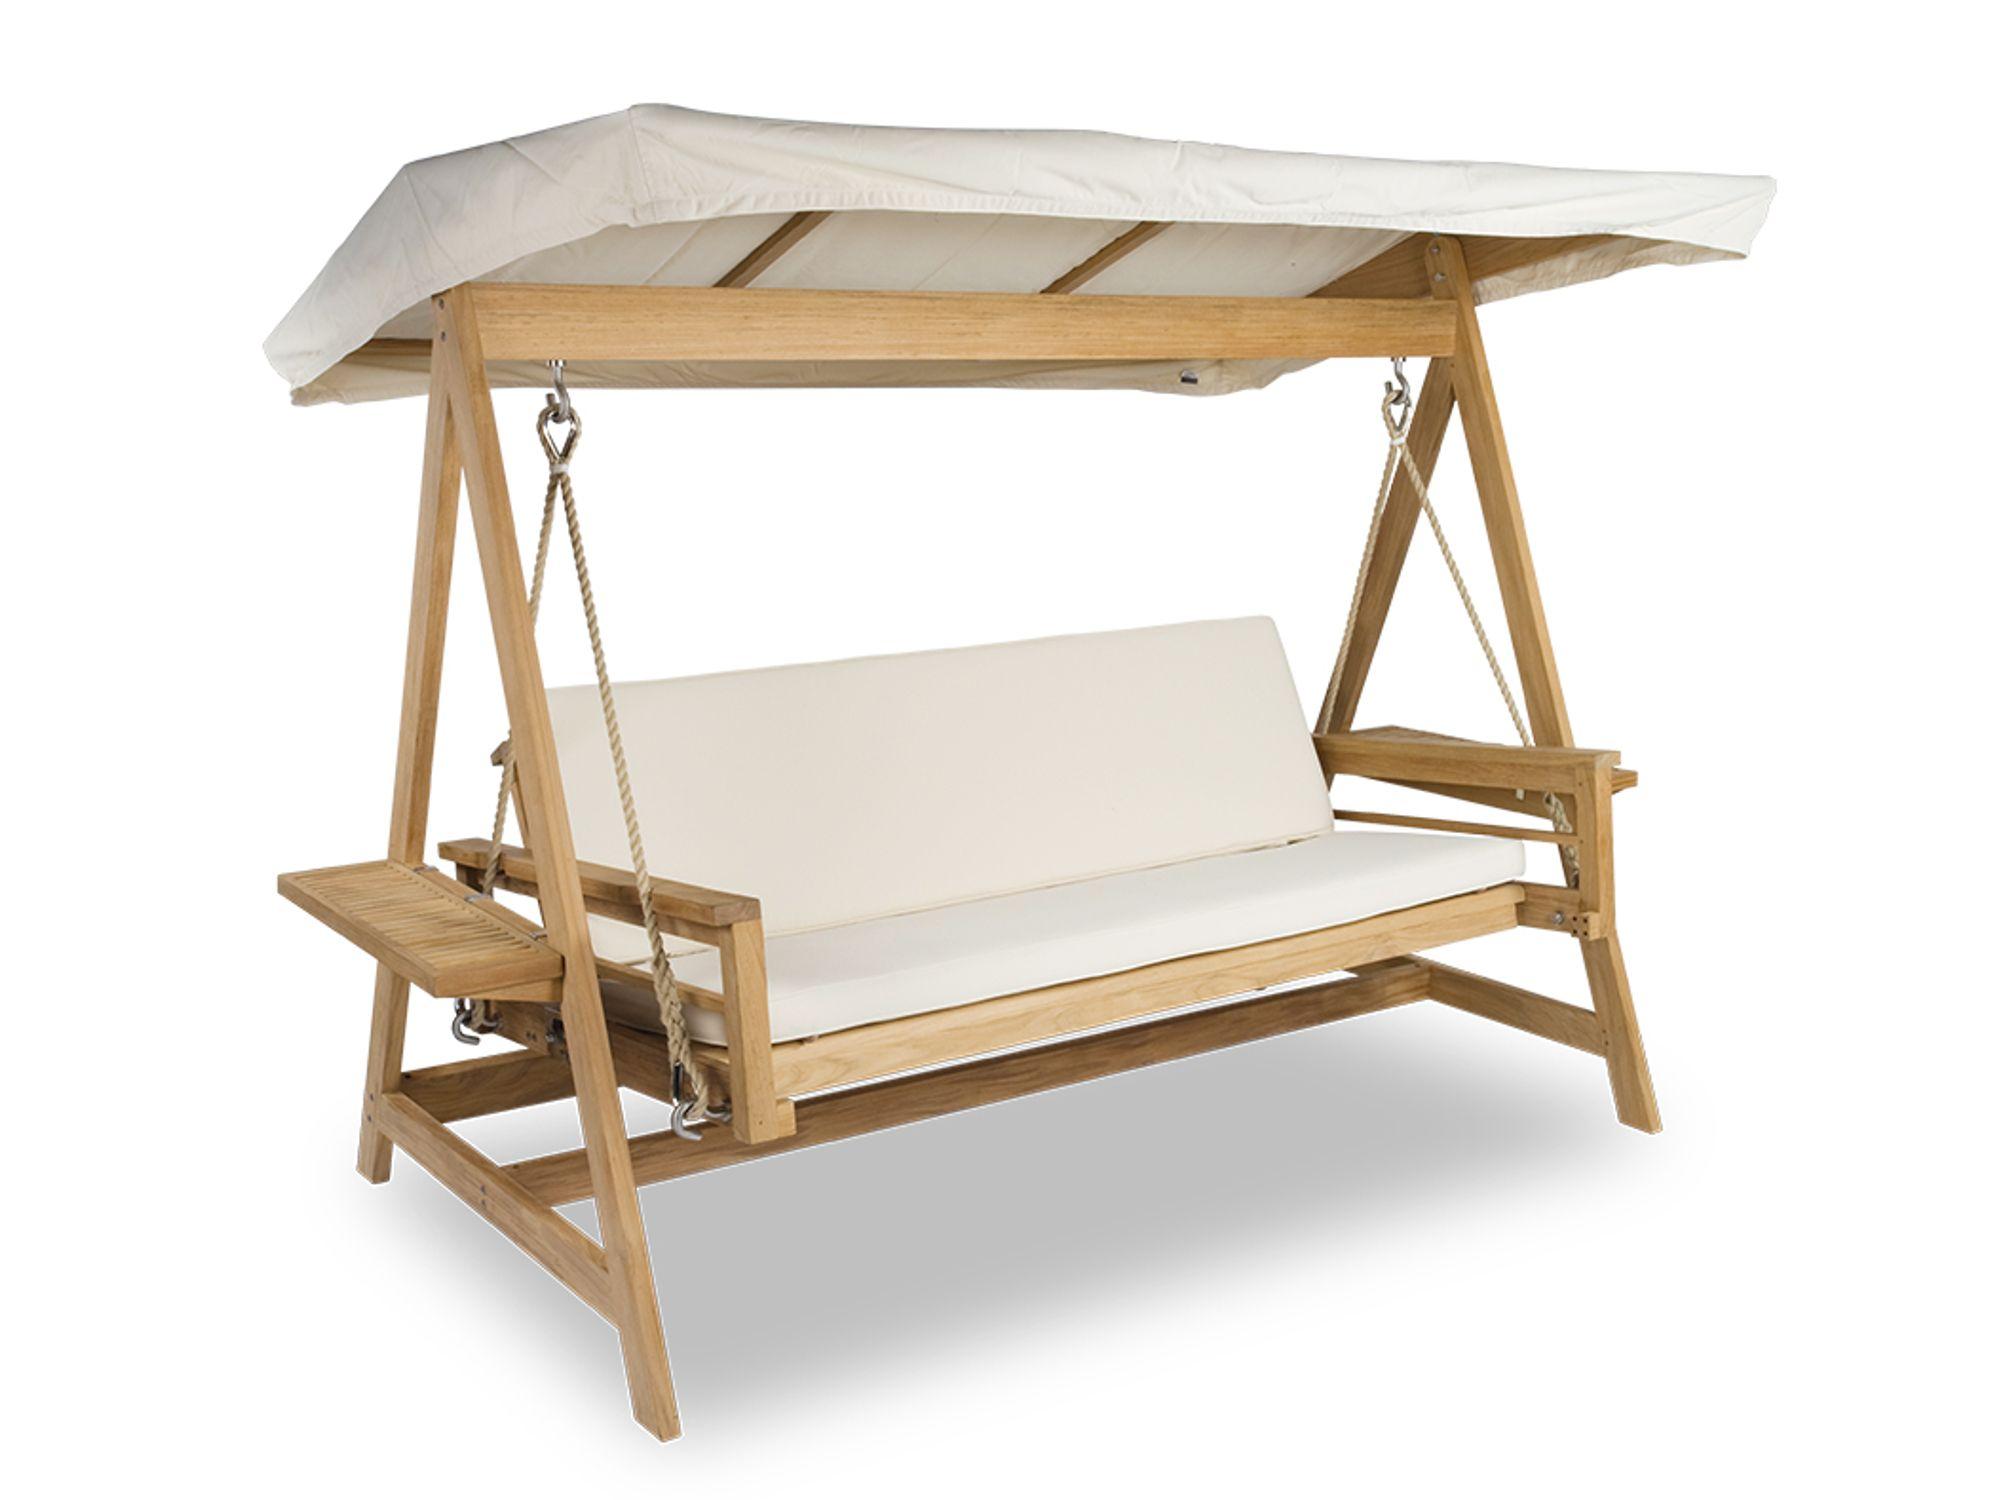 Gartenschaukeln | Gartenmöbel | Archiproducts Schaukel Im Garten Rattan Holz